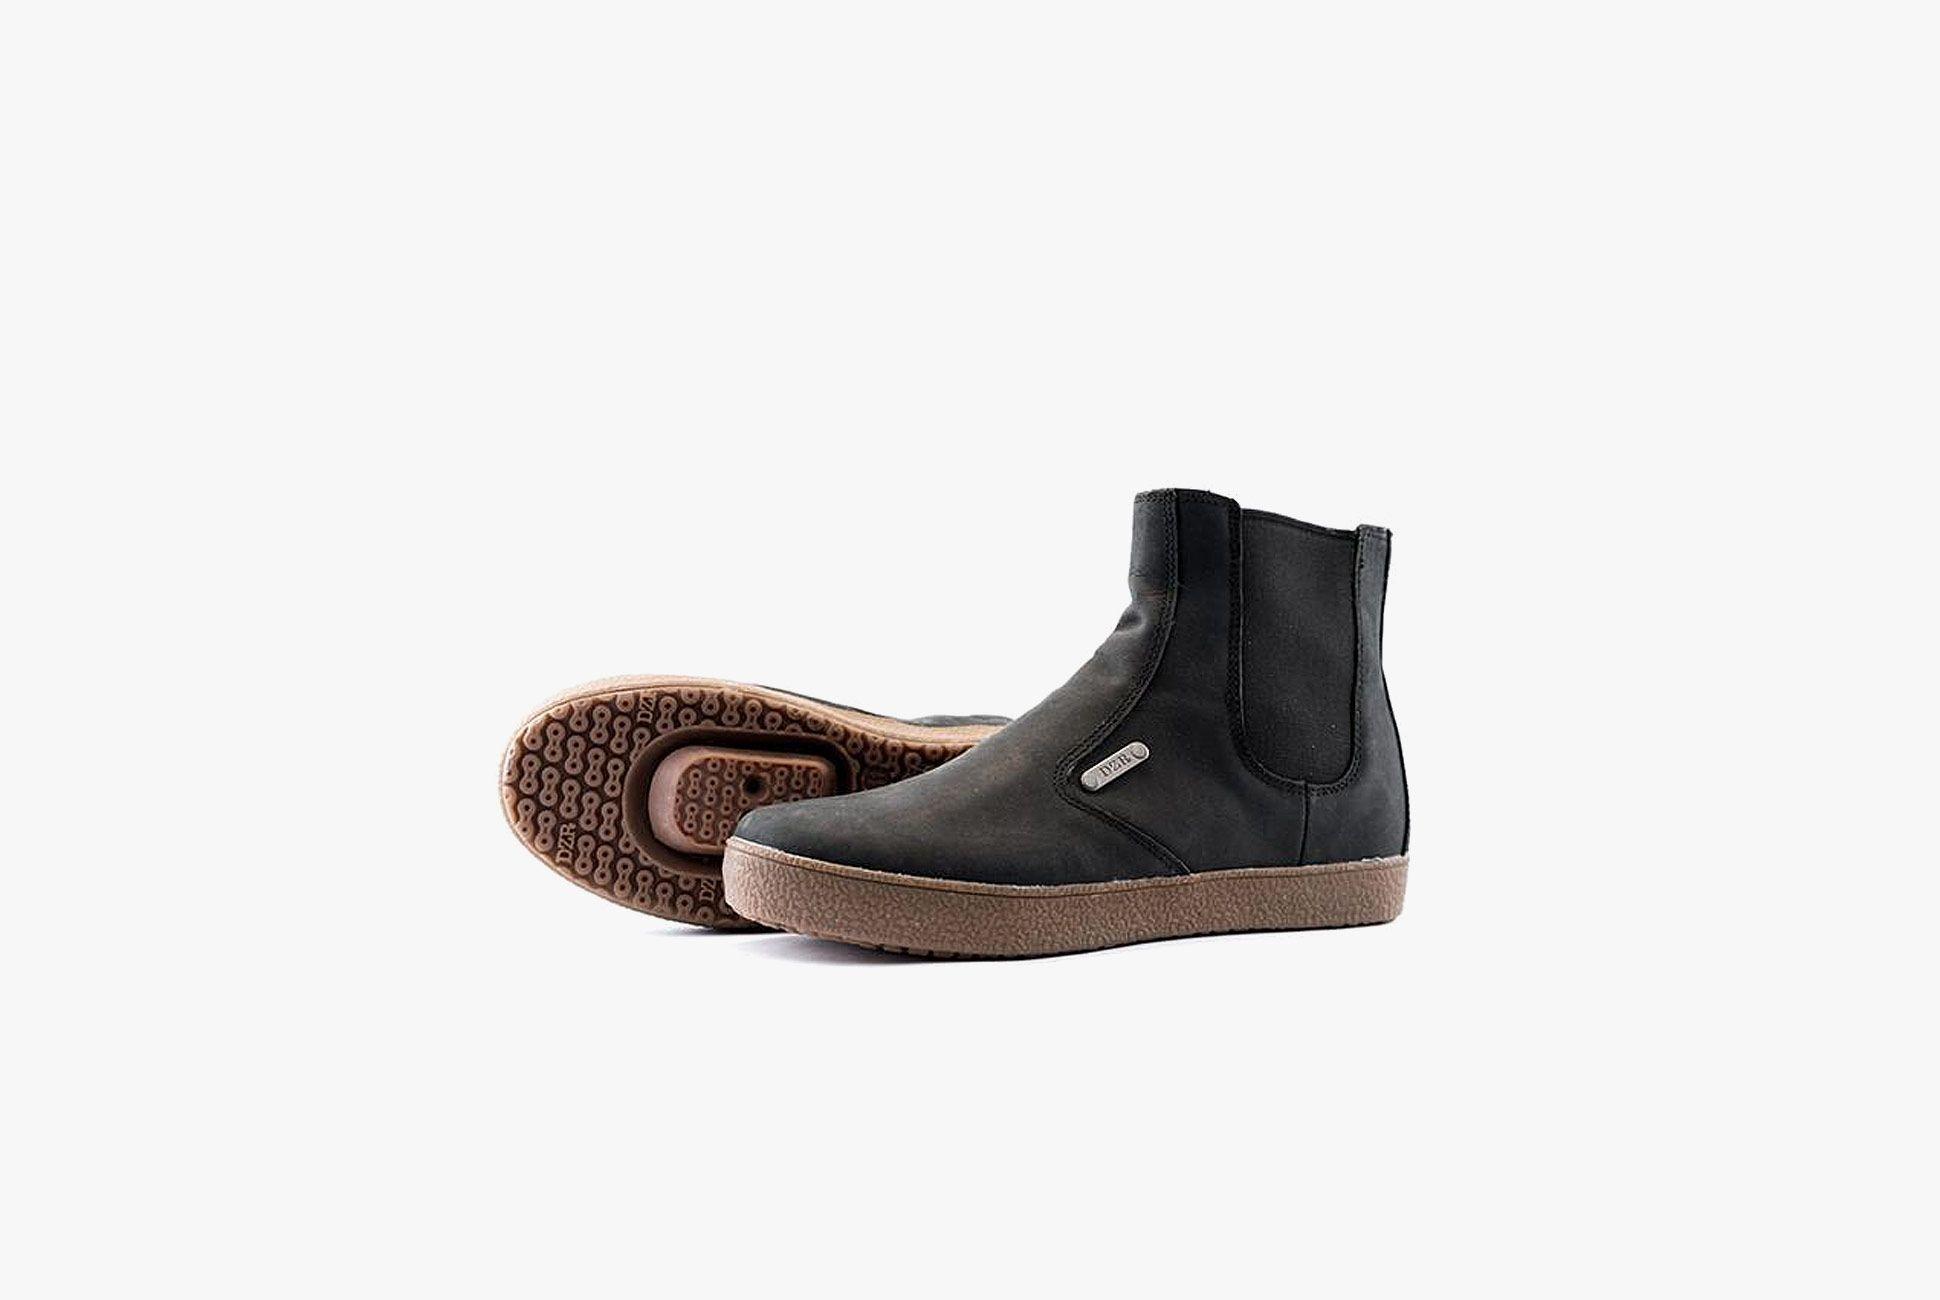 DZR-Shoes-gear-patrol-3